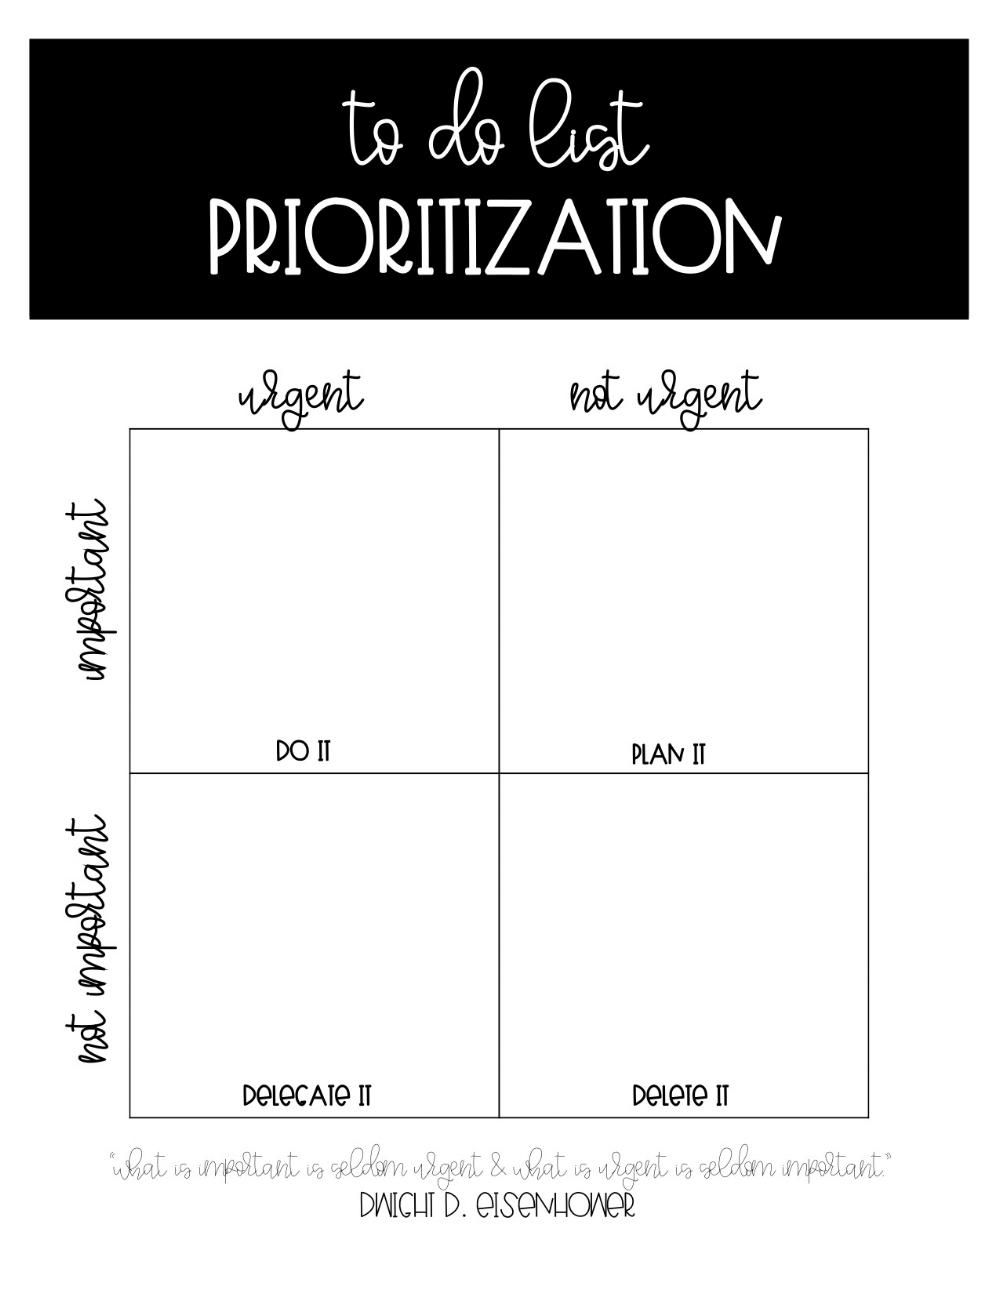 To Do List Prioritization.jpg